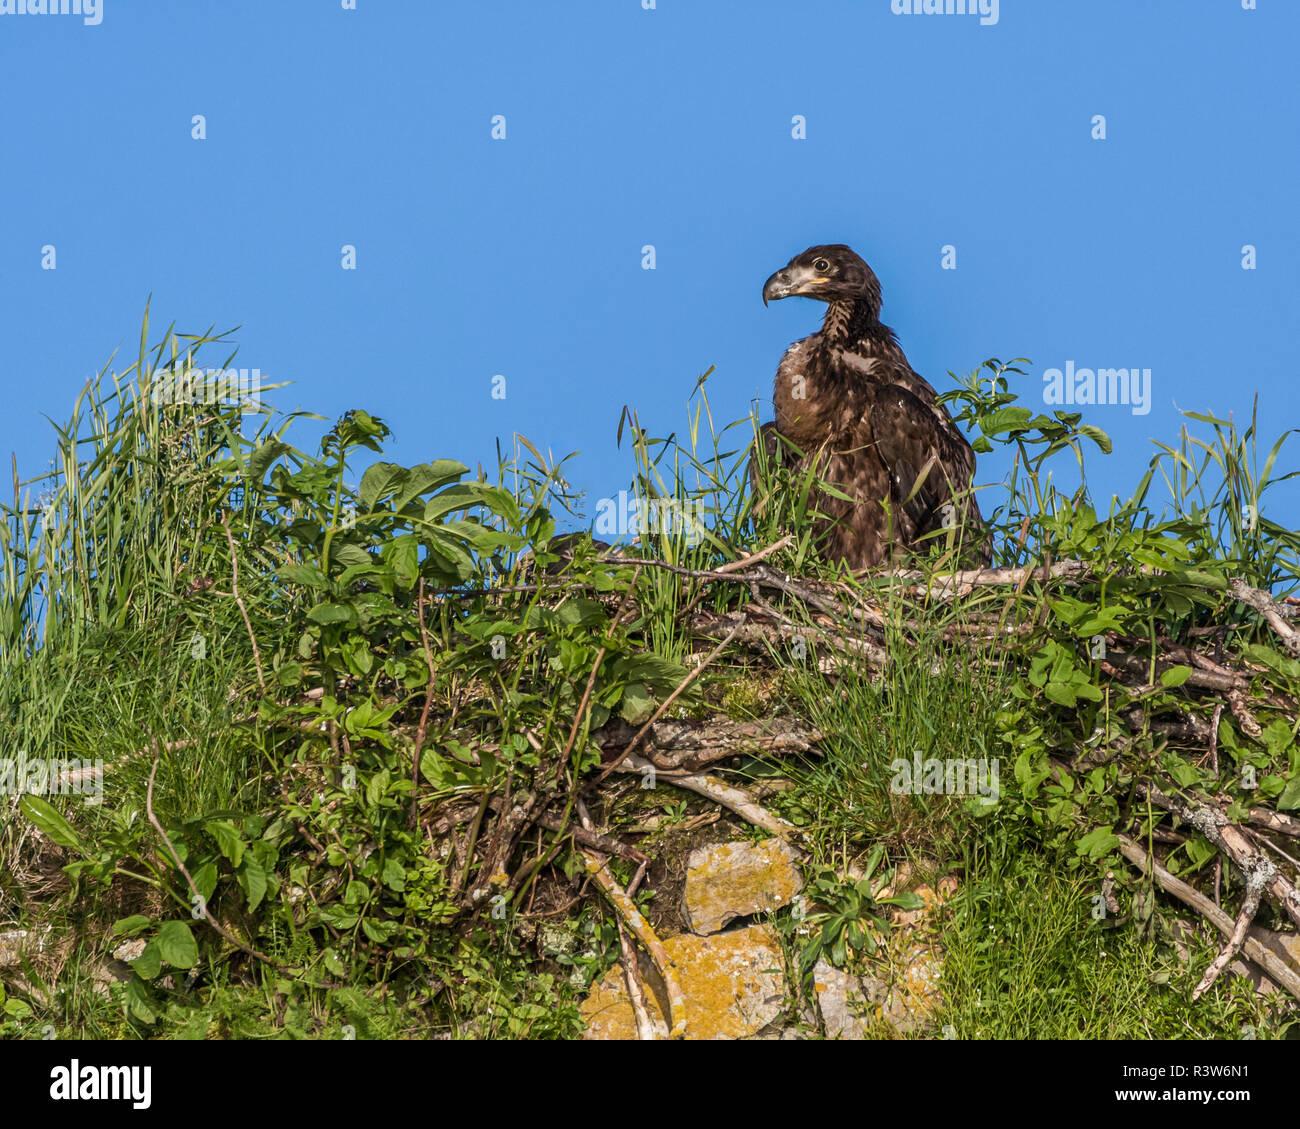 USA, Alaska, Katmai National Park, Kukak Bay. Baby bald eagle, Haliaeetus Leucocephalus, in its nest. Stock Photo